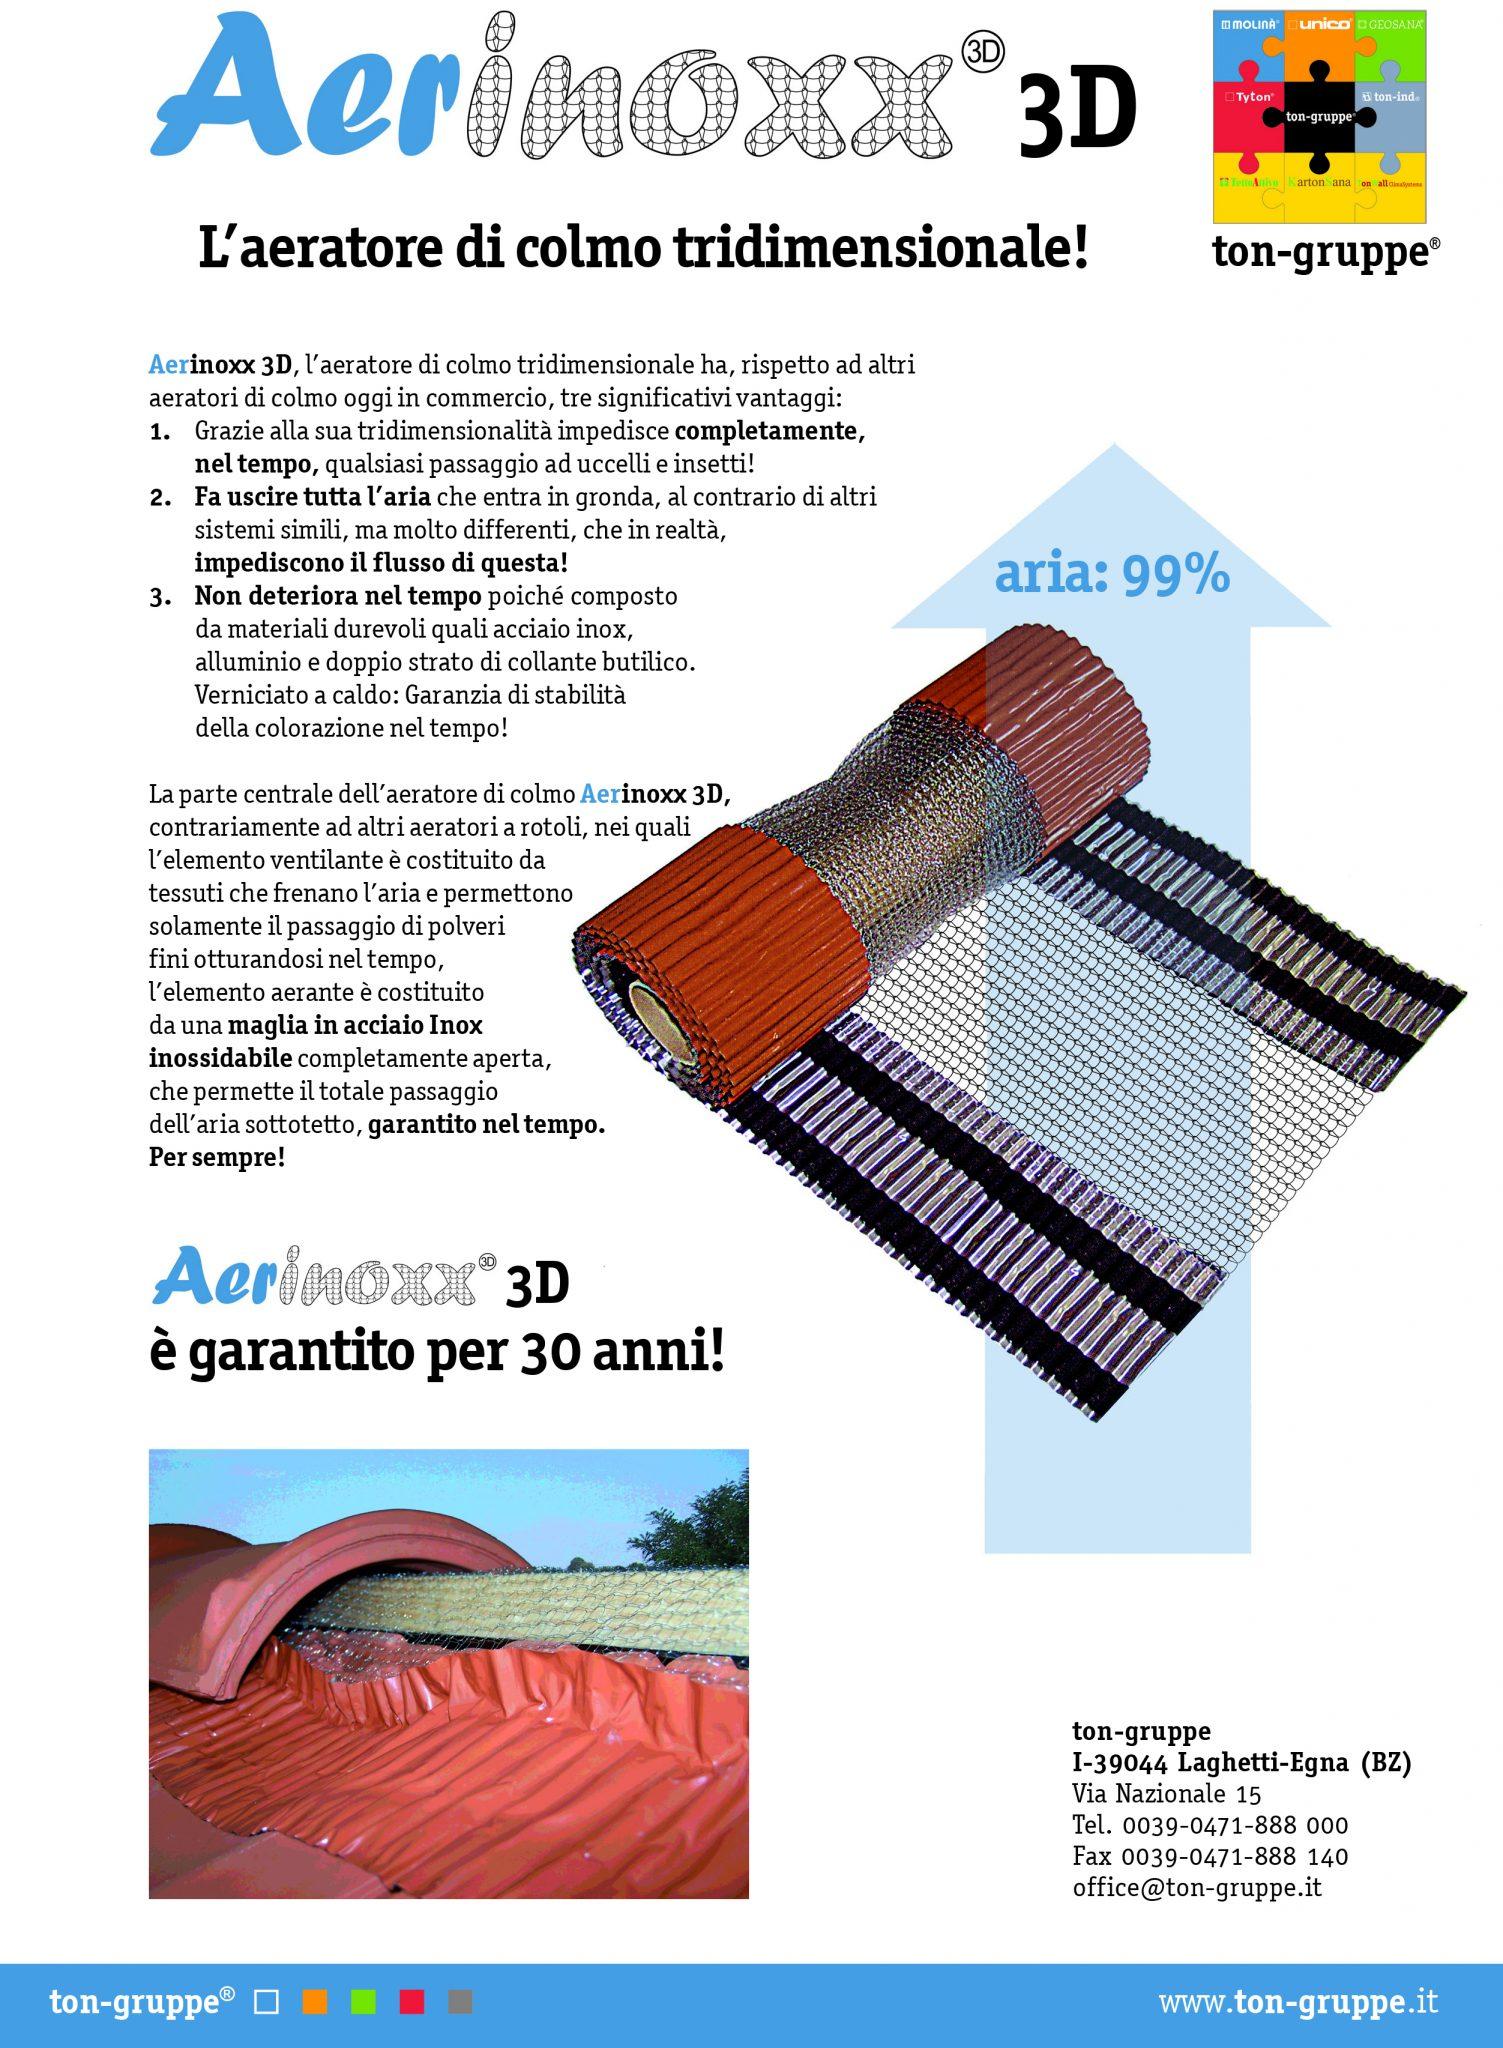 Aerinoxx3D_IT_2011.pmd